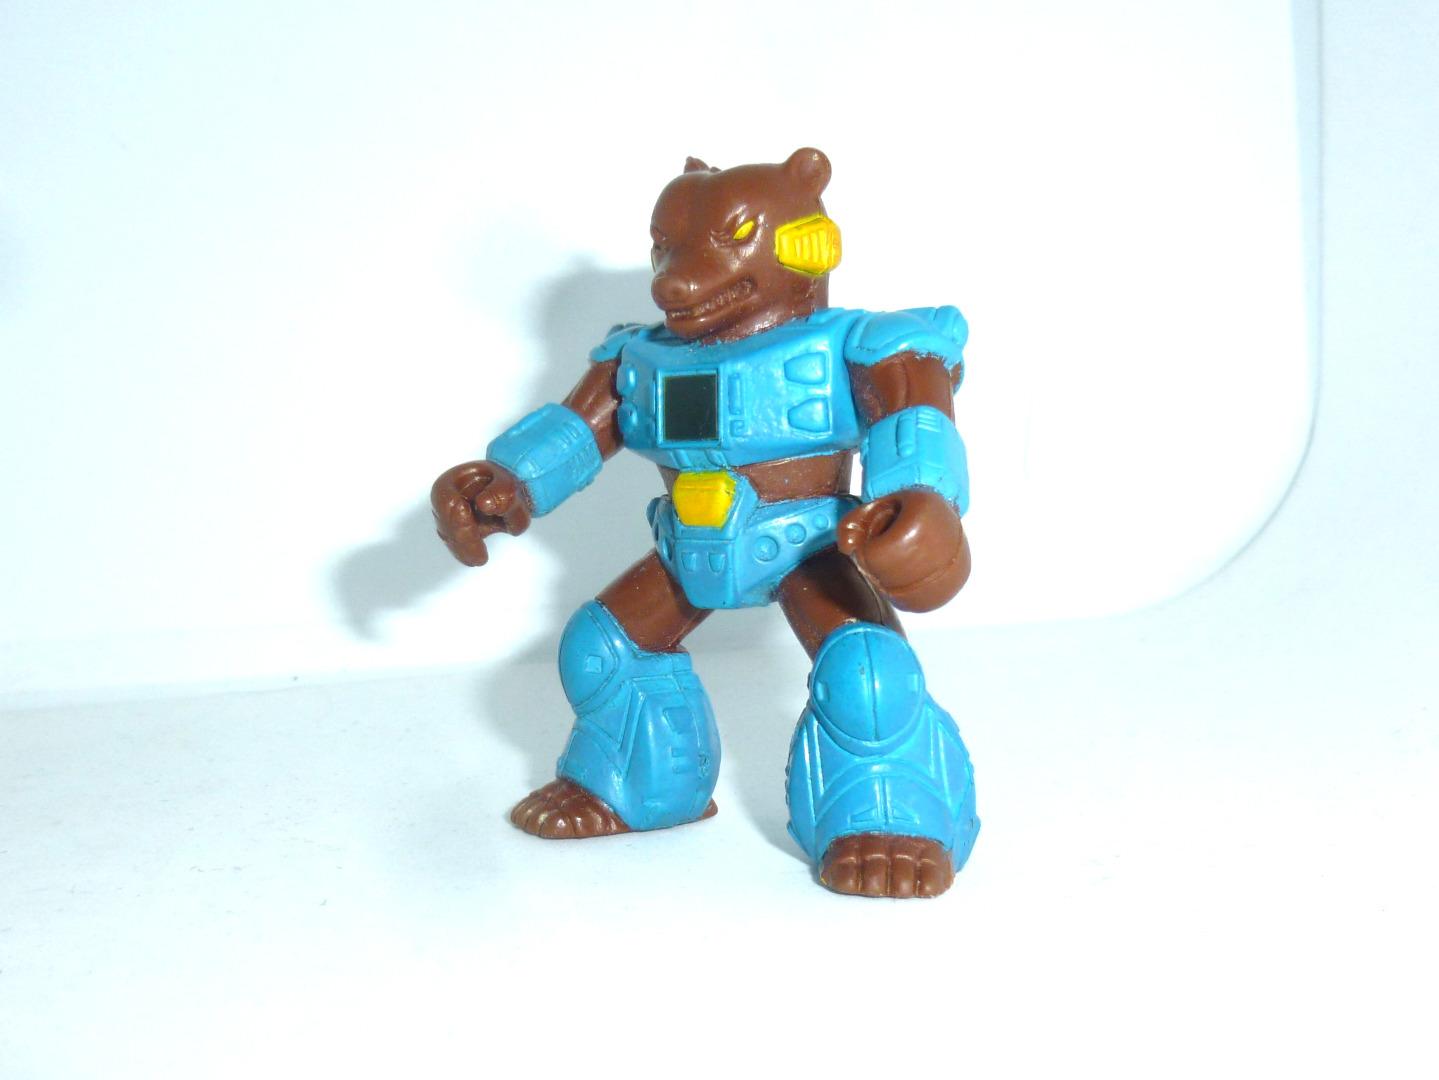 Battle Beasts Grizzly Bear Actionfigur Jetzt - 4